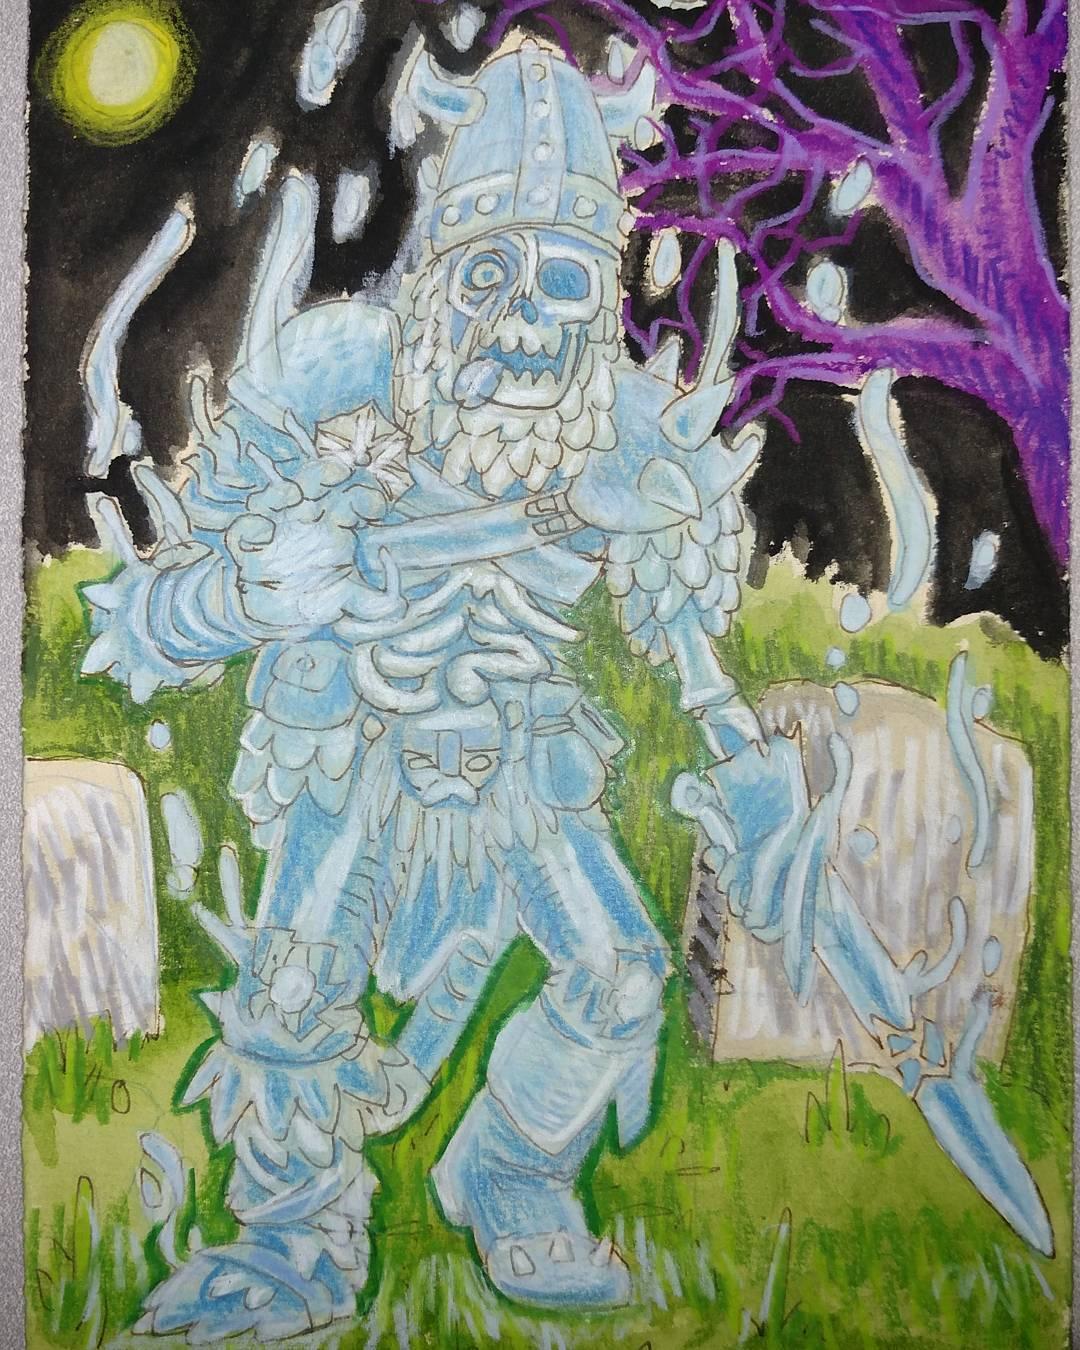 "redjarojam ""Ghost/Skeleton/Zombie"" - by Jared DeCosta (redjarojam) www.instagram.com/redjarojam (2016-2019) © dell'autore tutti i diritti riservati"